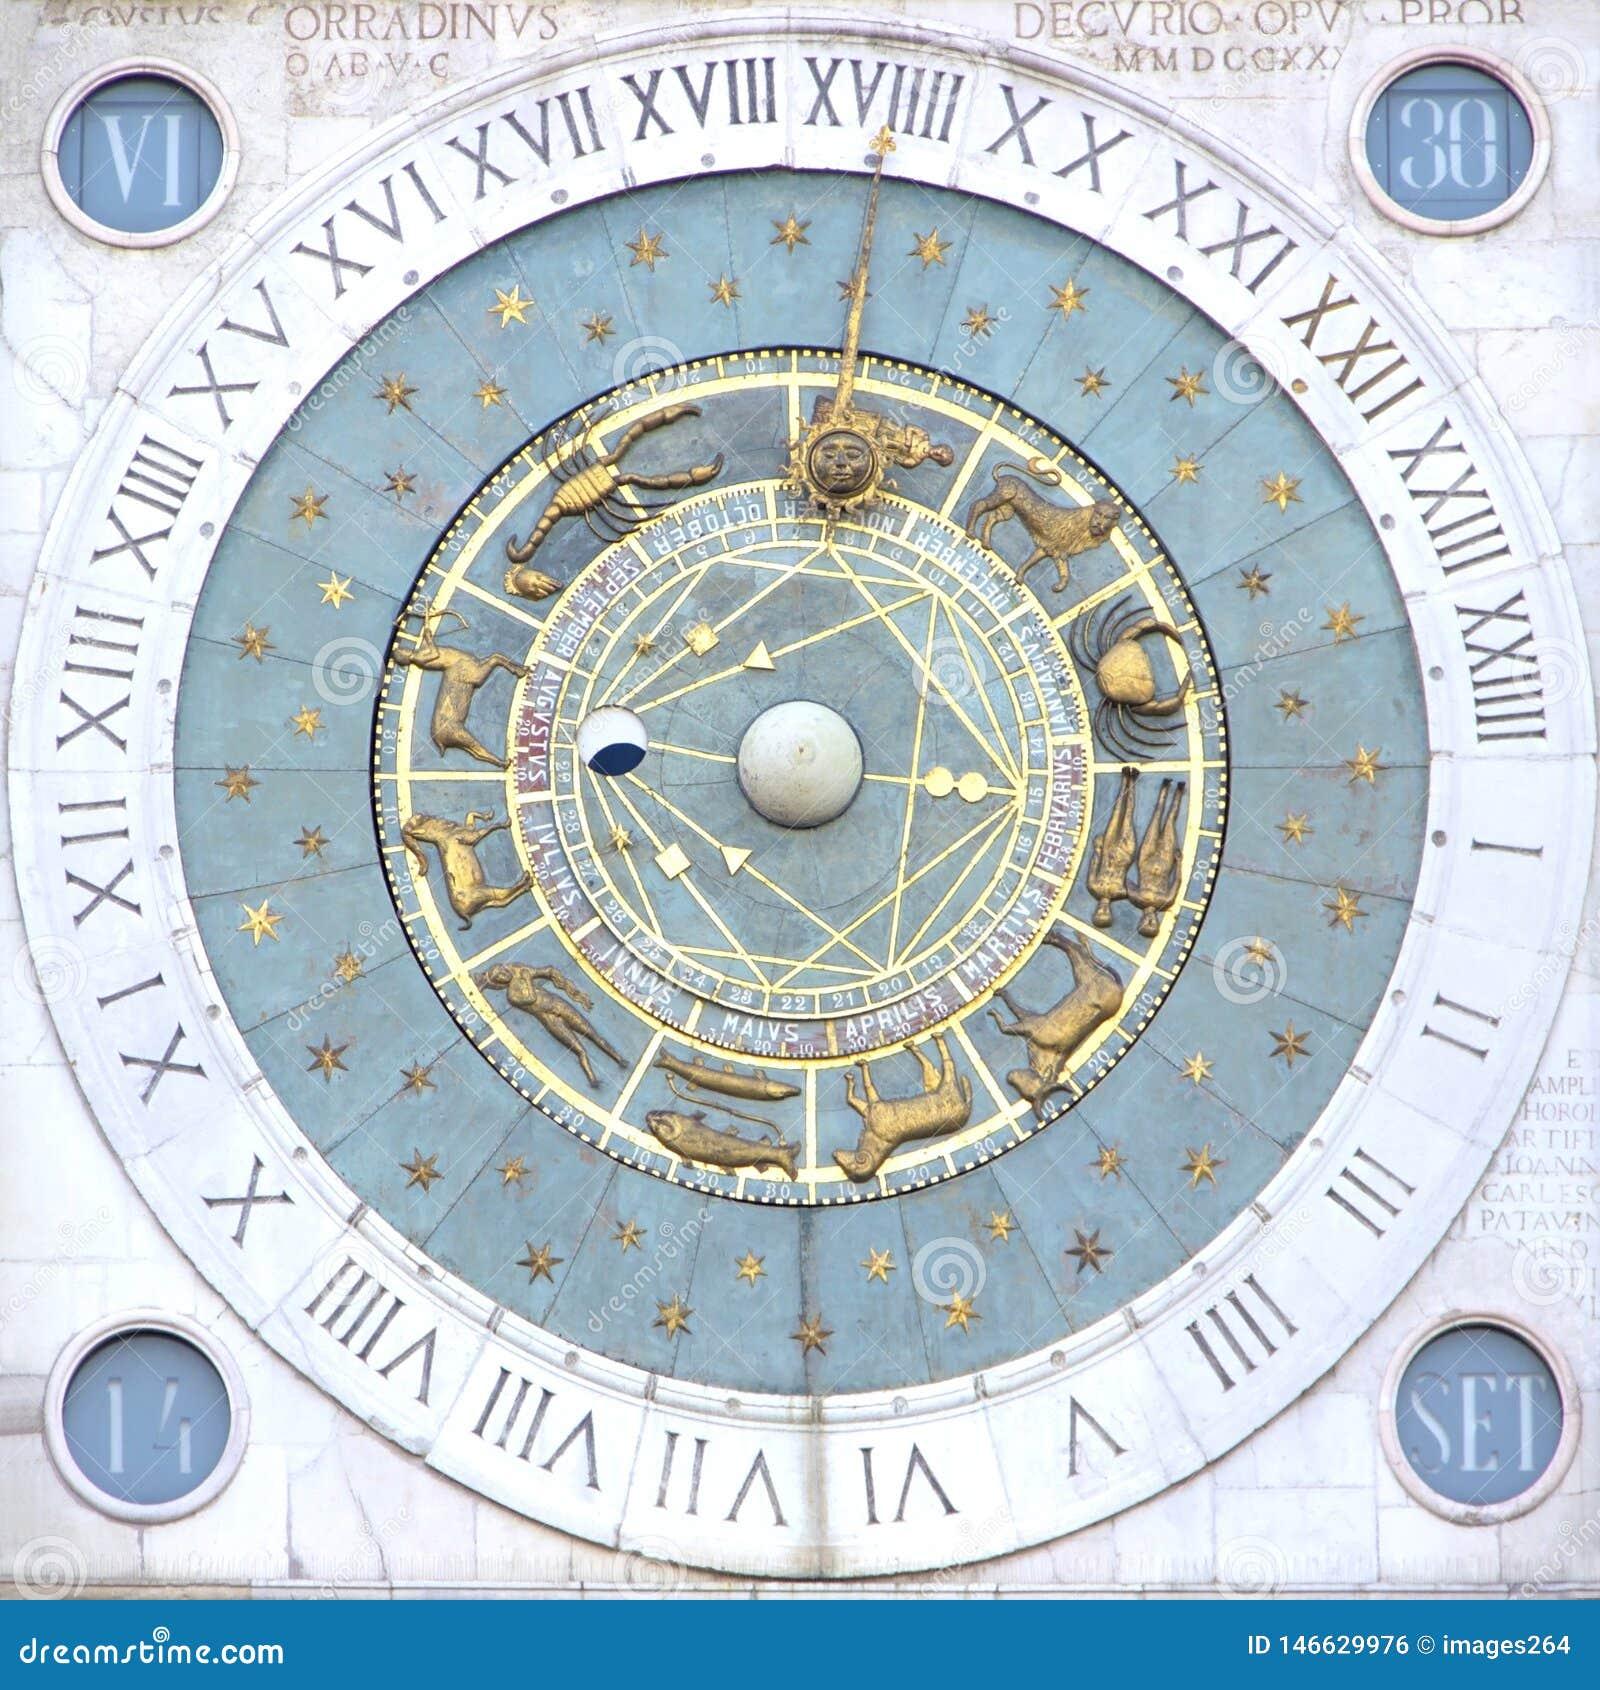 Zodiak clock in Padua, Italy